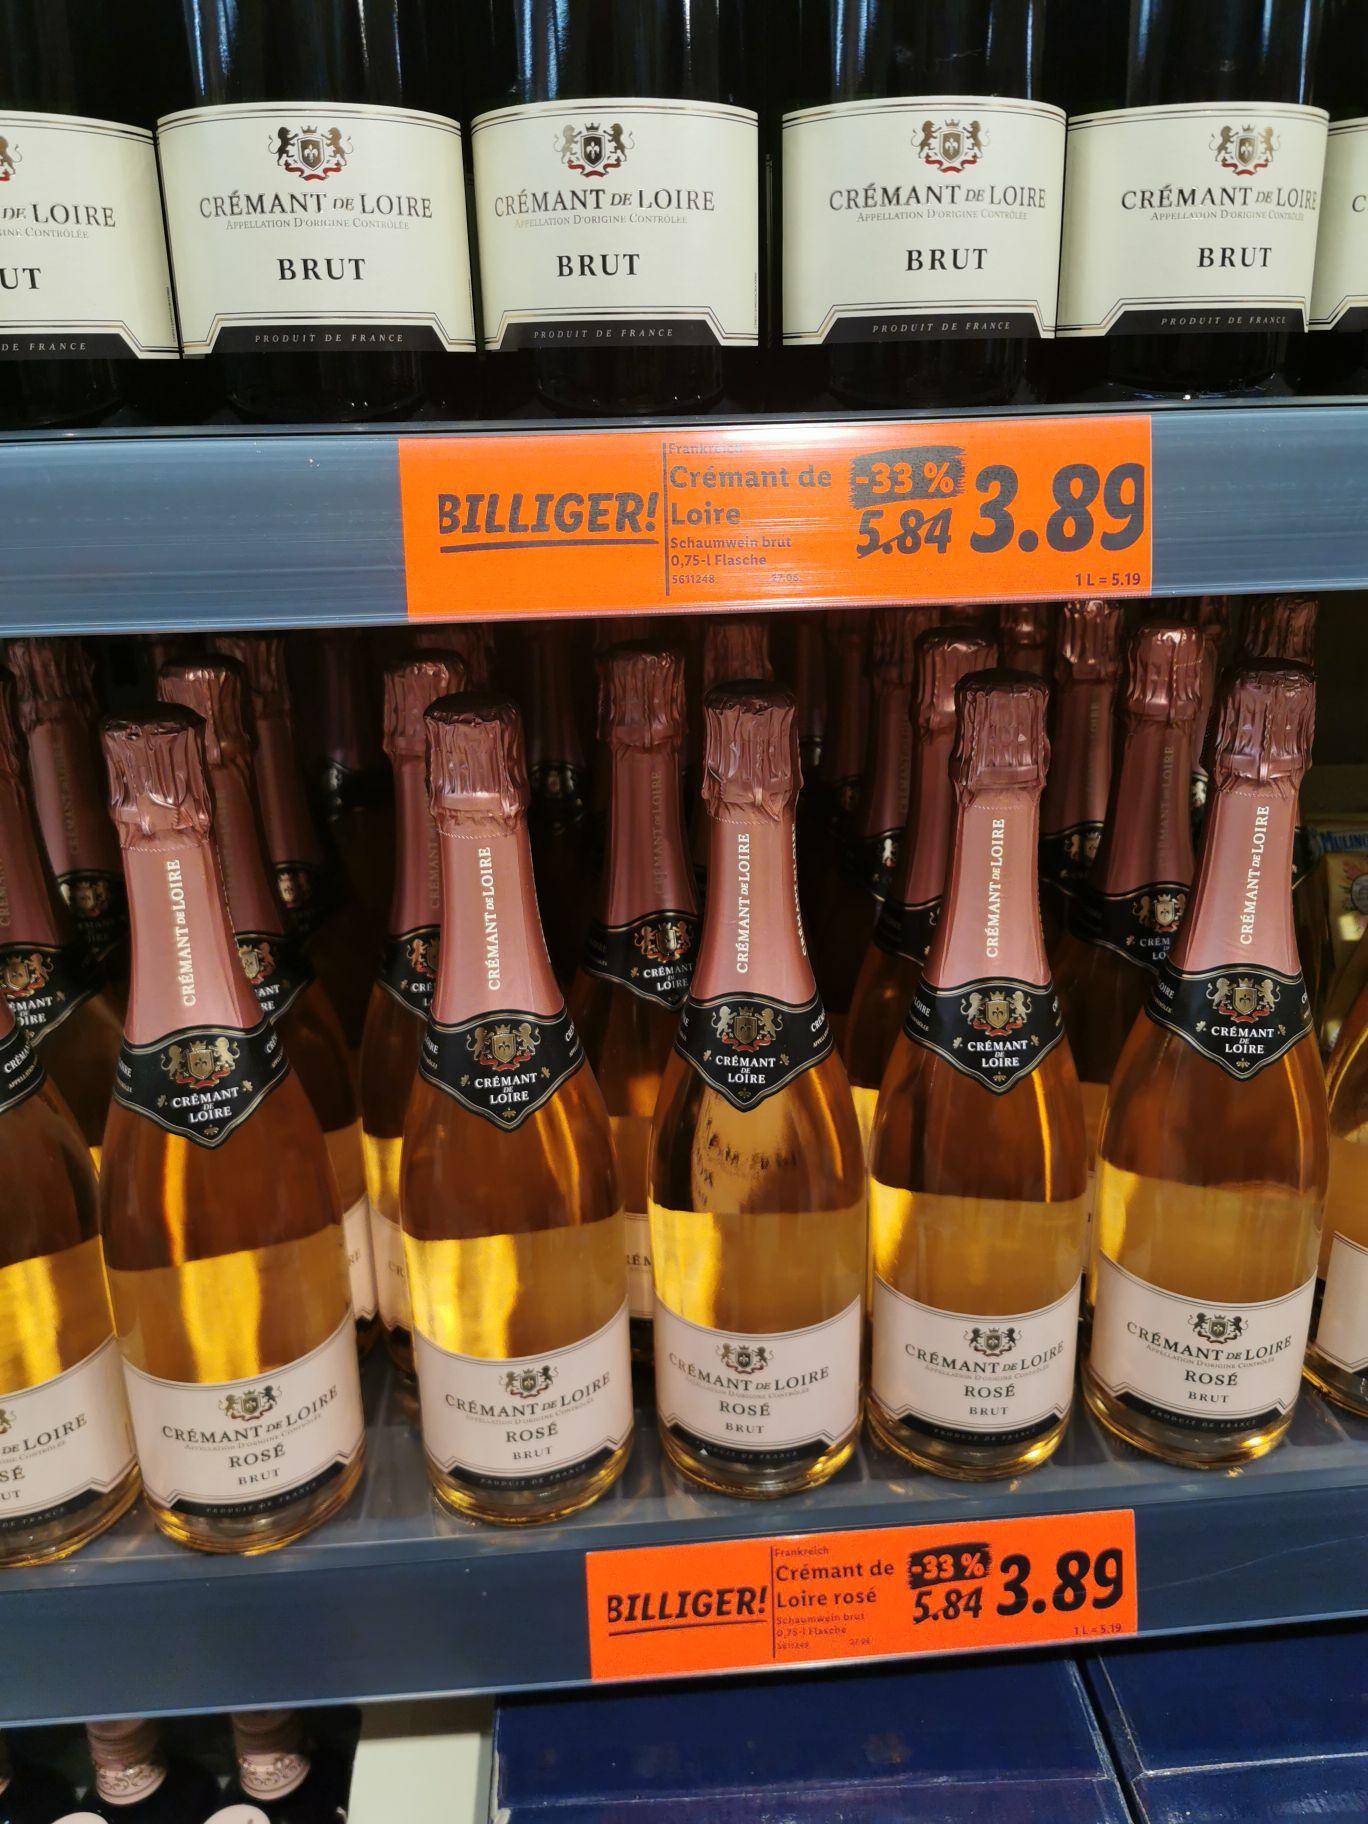 [Lokal] Offline Lidl Düsseldorf Carlsplatz Cremant de Loire brut oder rosé